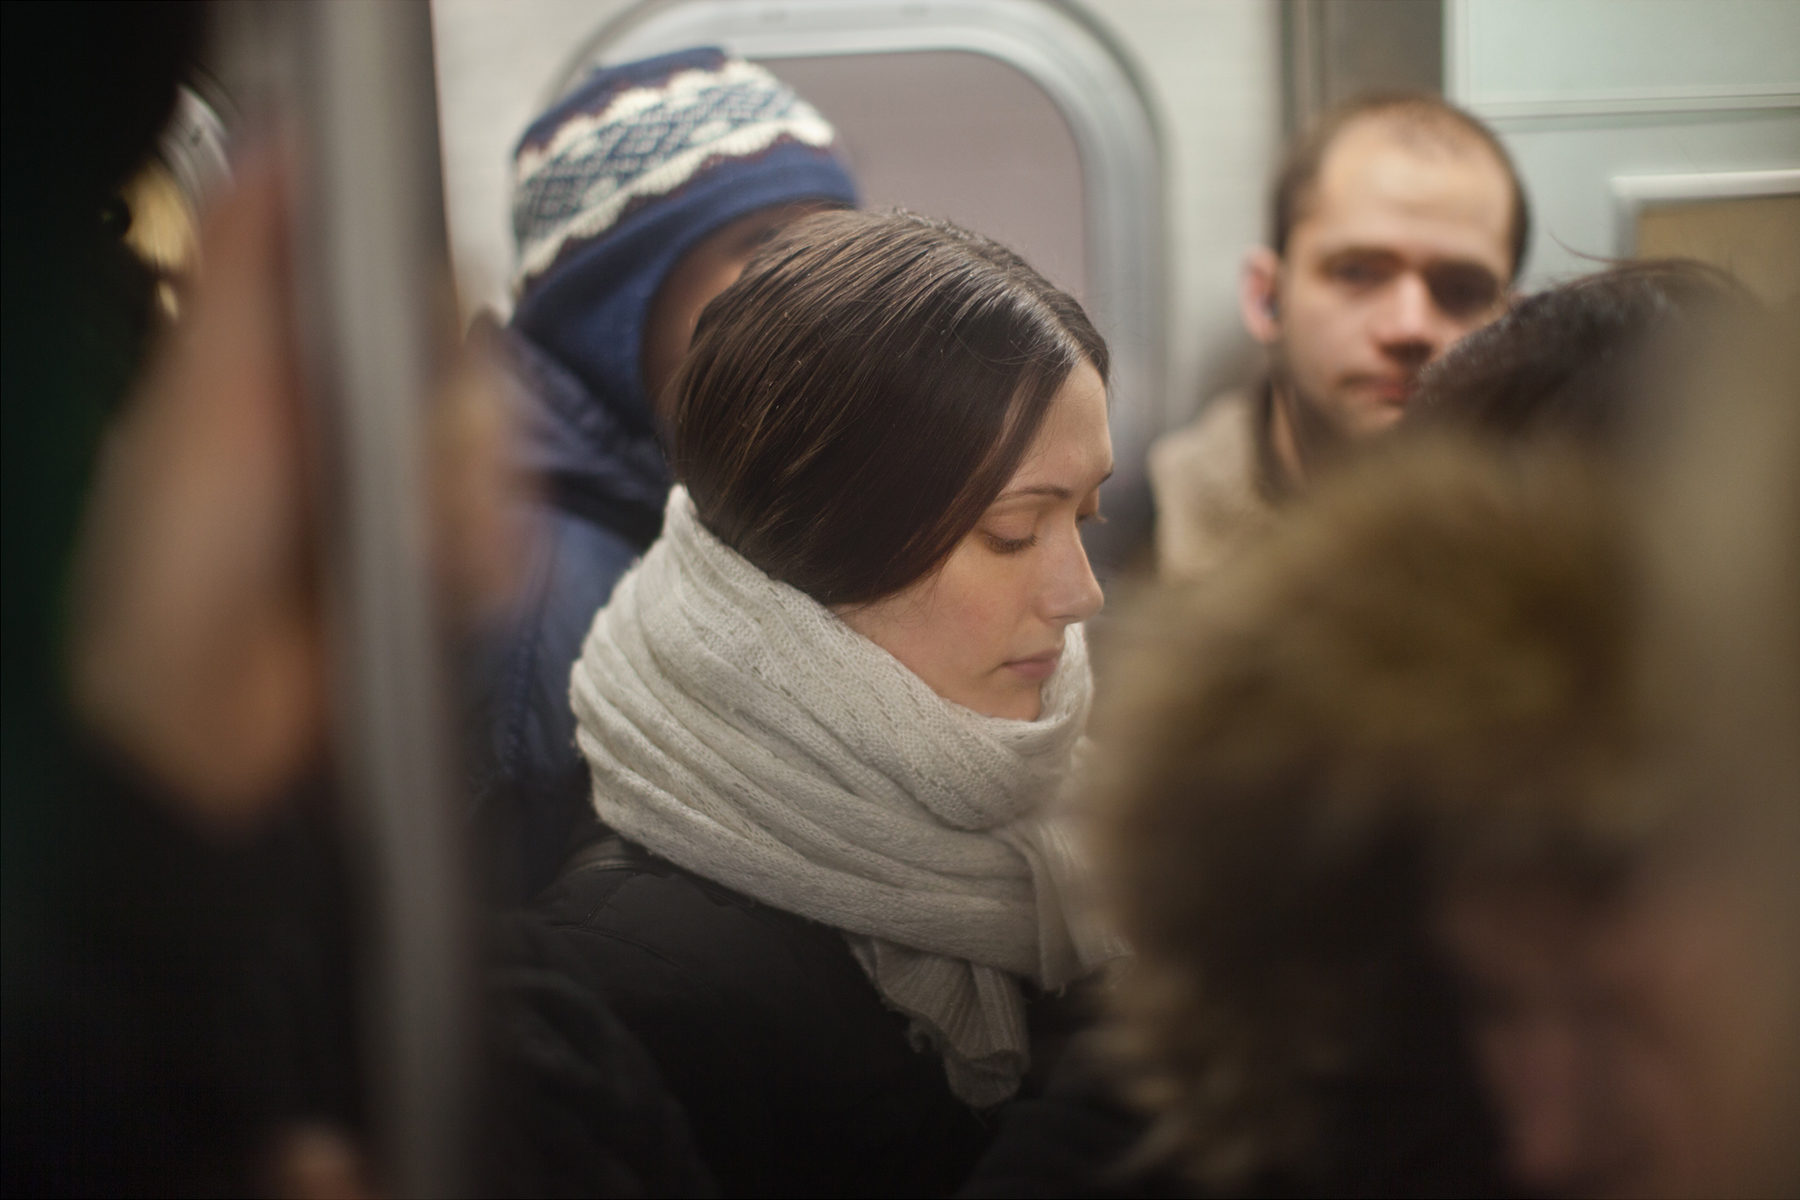 SubwayGirl